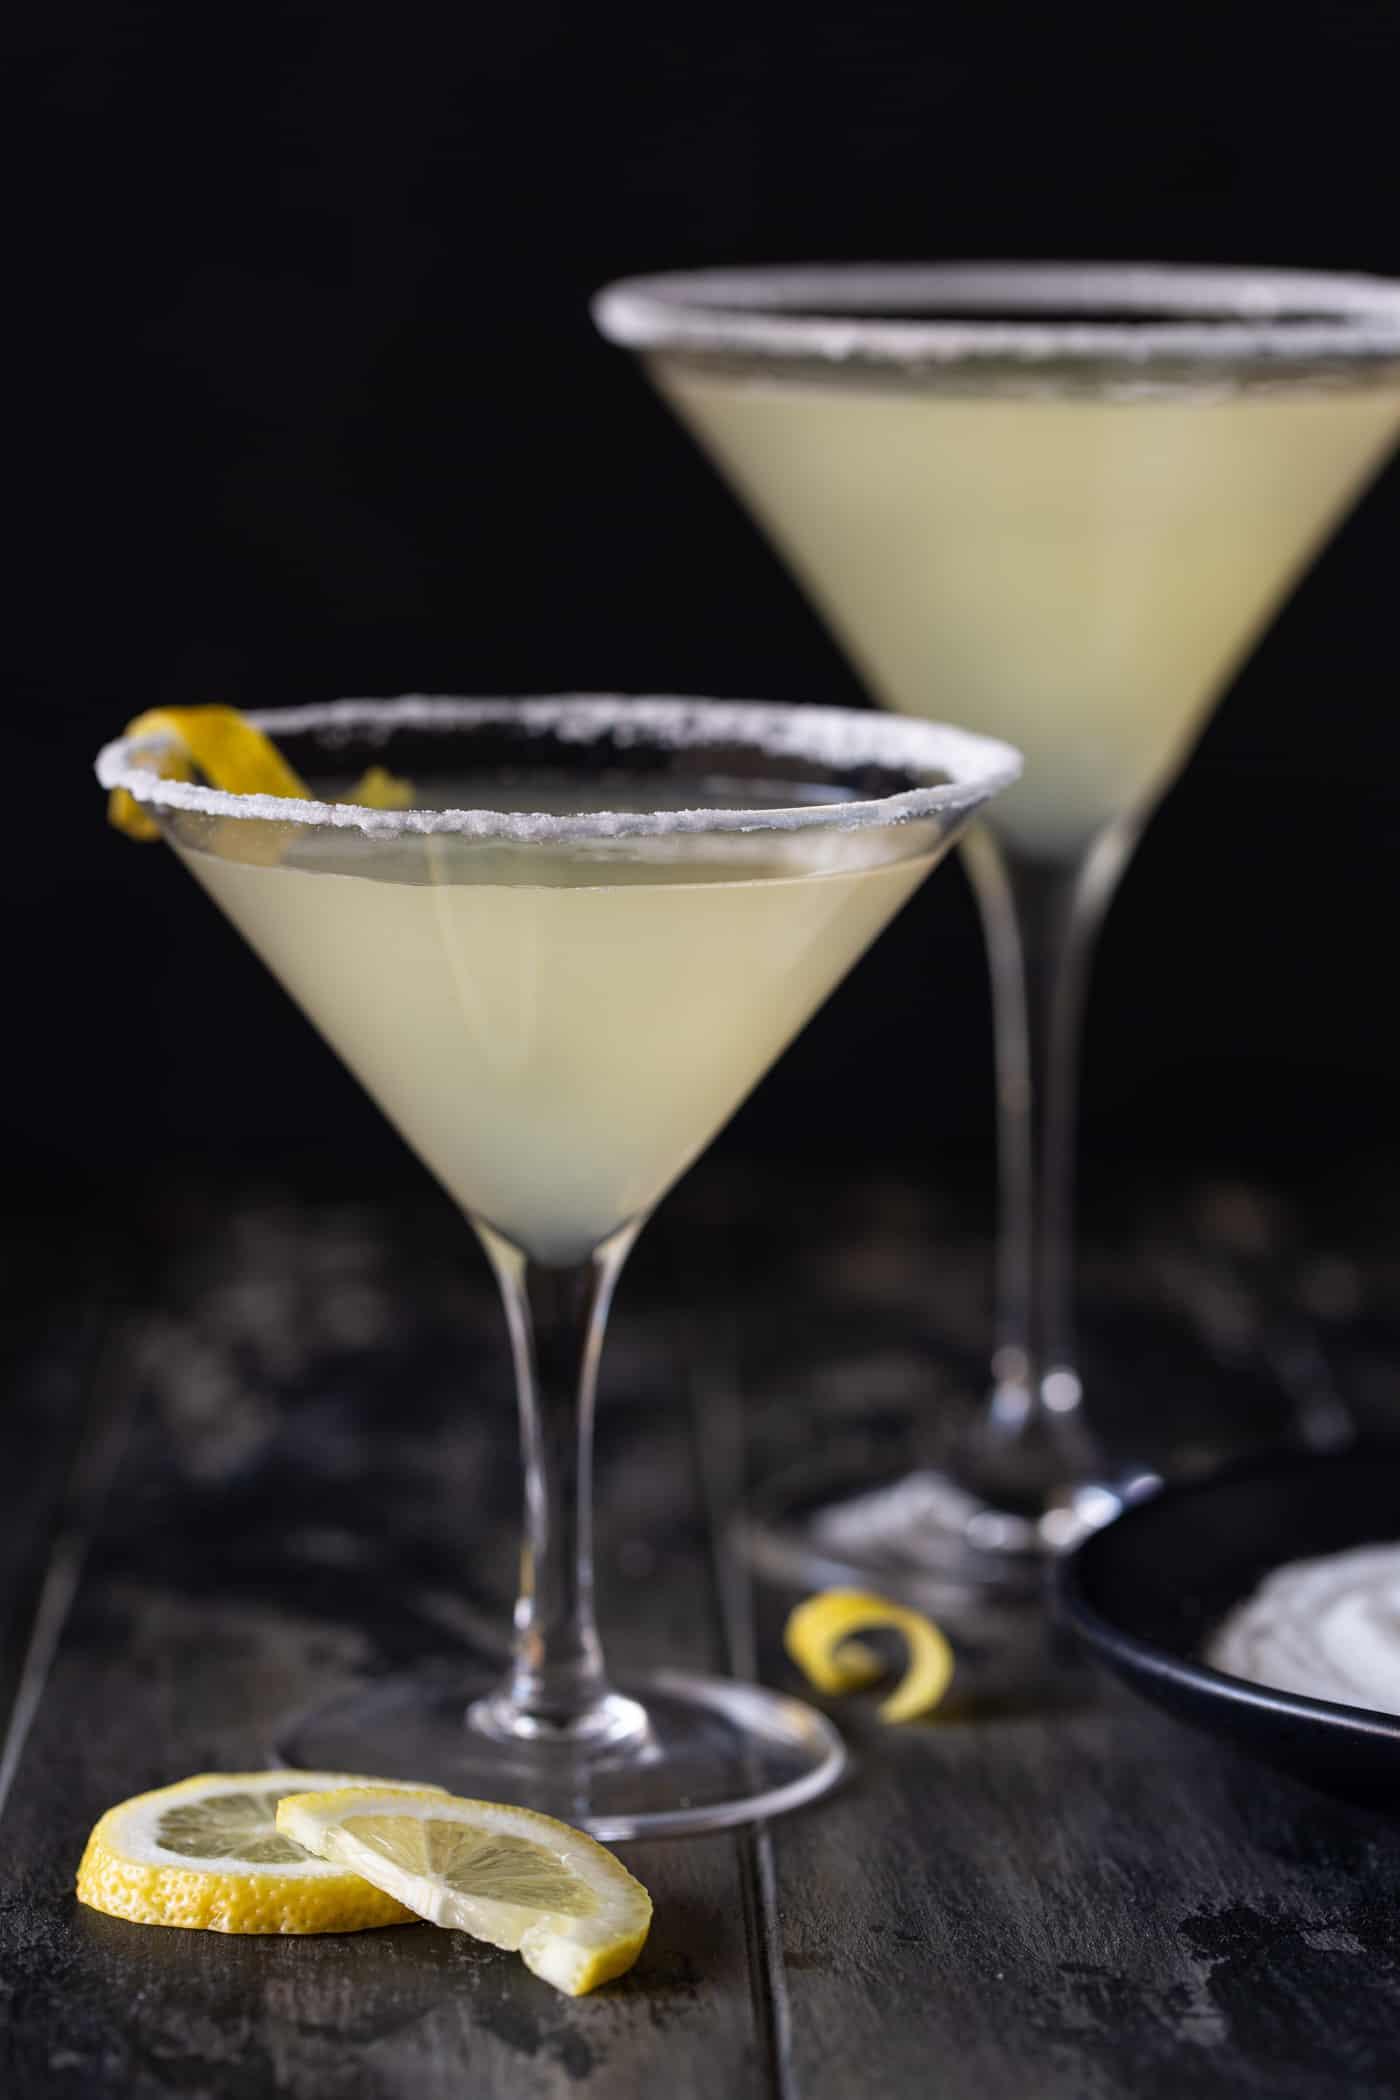 Lemon drop martinis in glasses with lemon twists for garnish.